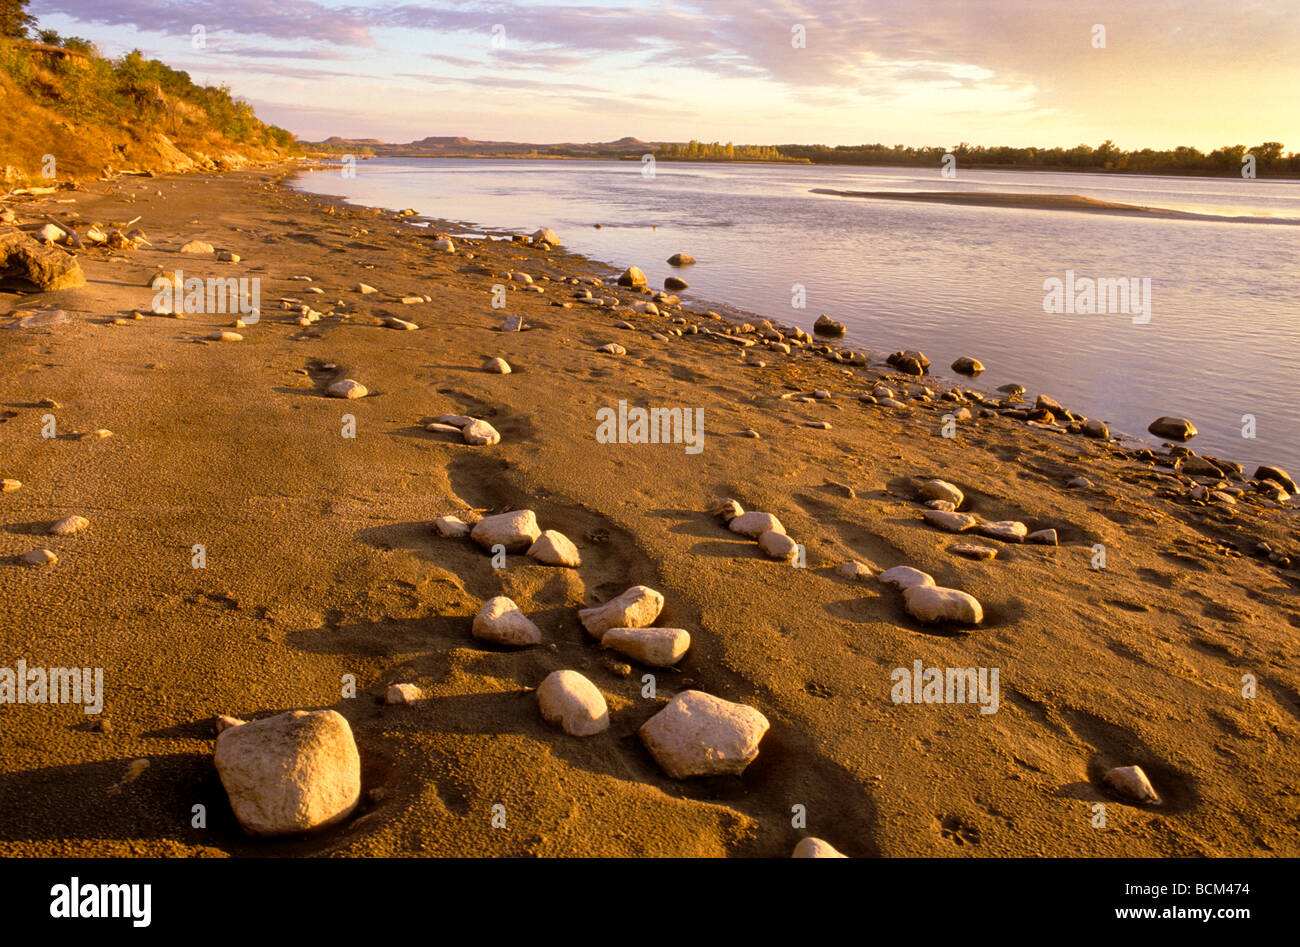 Rocky Beach at Sunrise - Stock Image